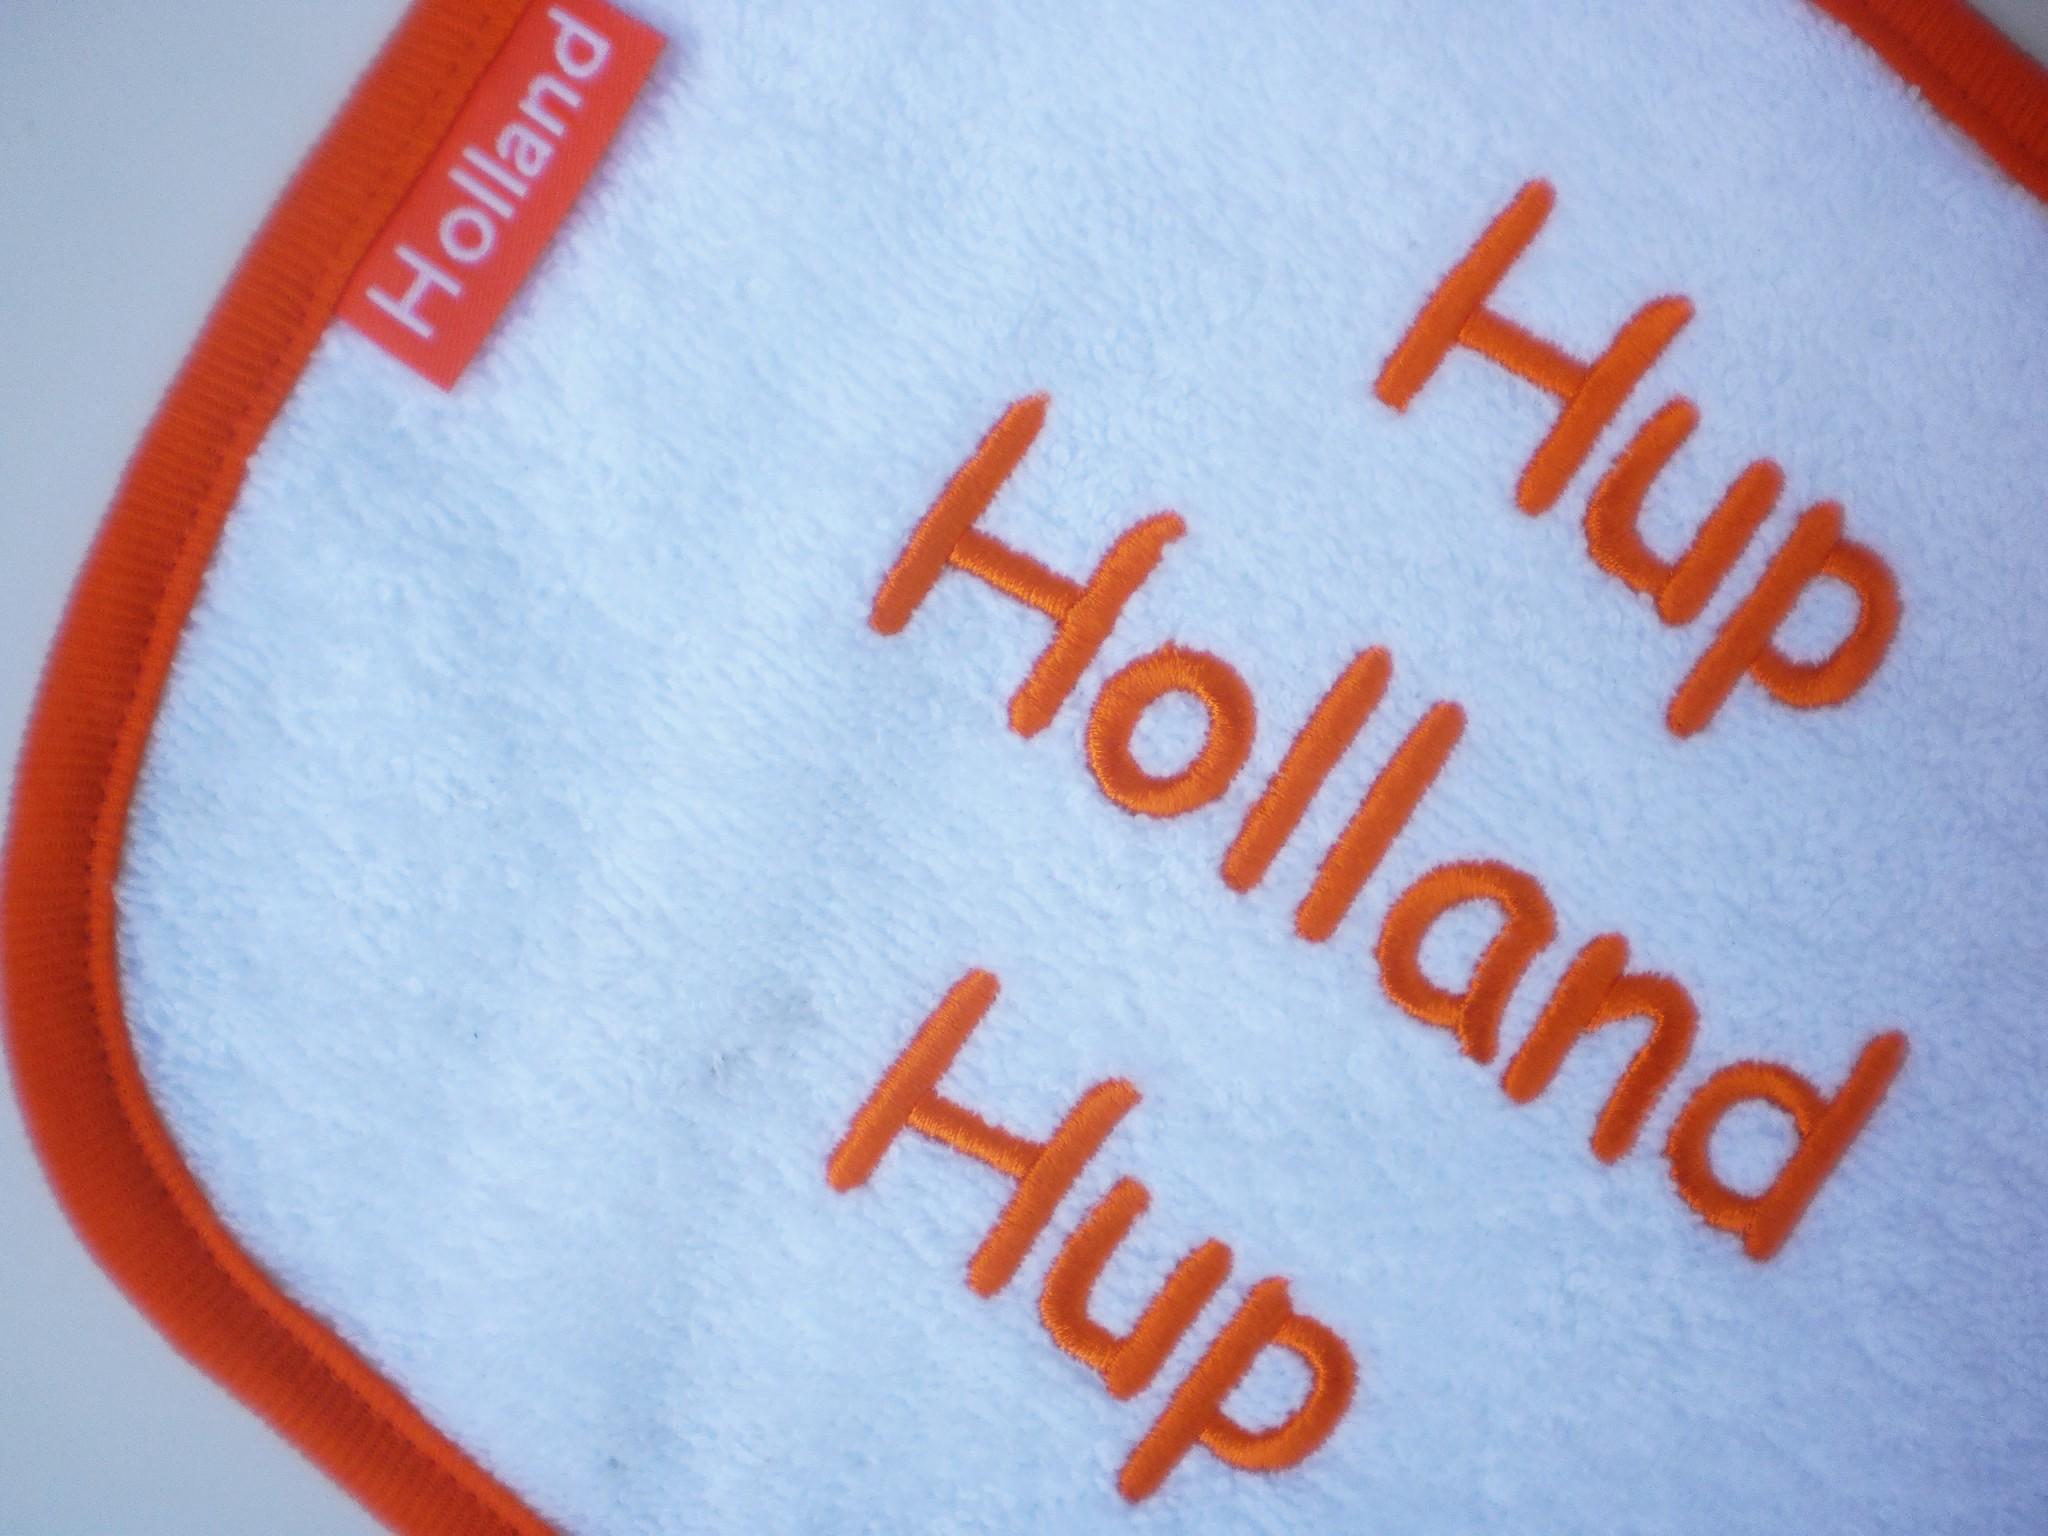 Winactie: Hup Holland Hup Slabbetje (2x) (Gesloten)